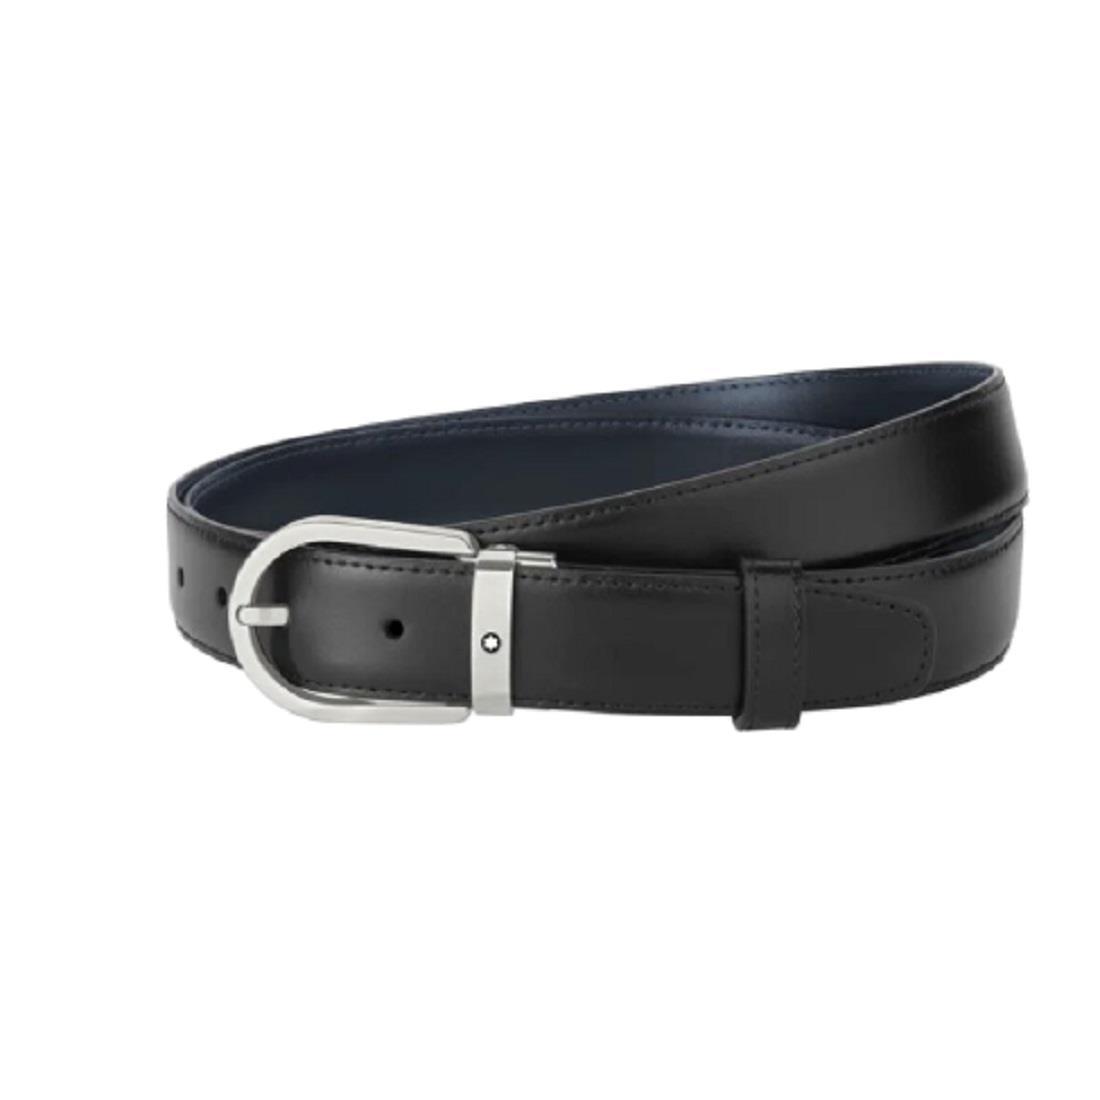 Cintura reversibile in pelle blu/nera - MONTBLANC